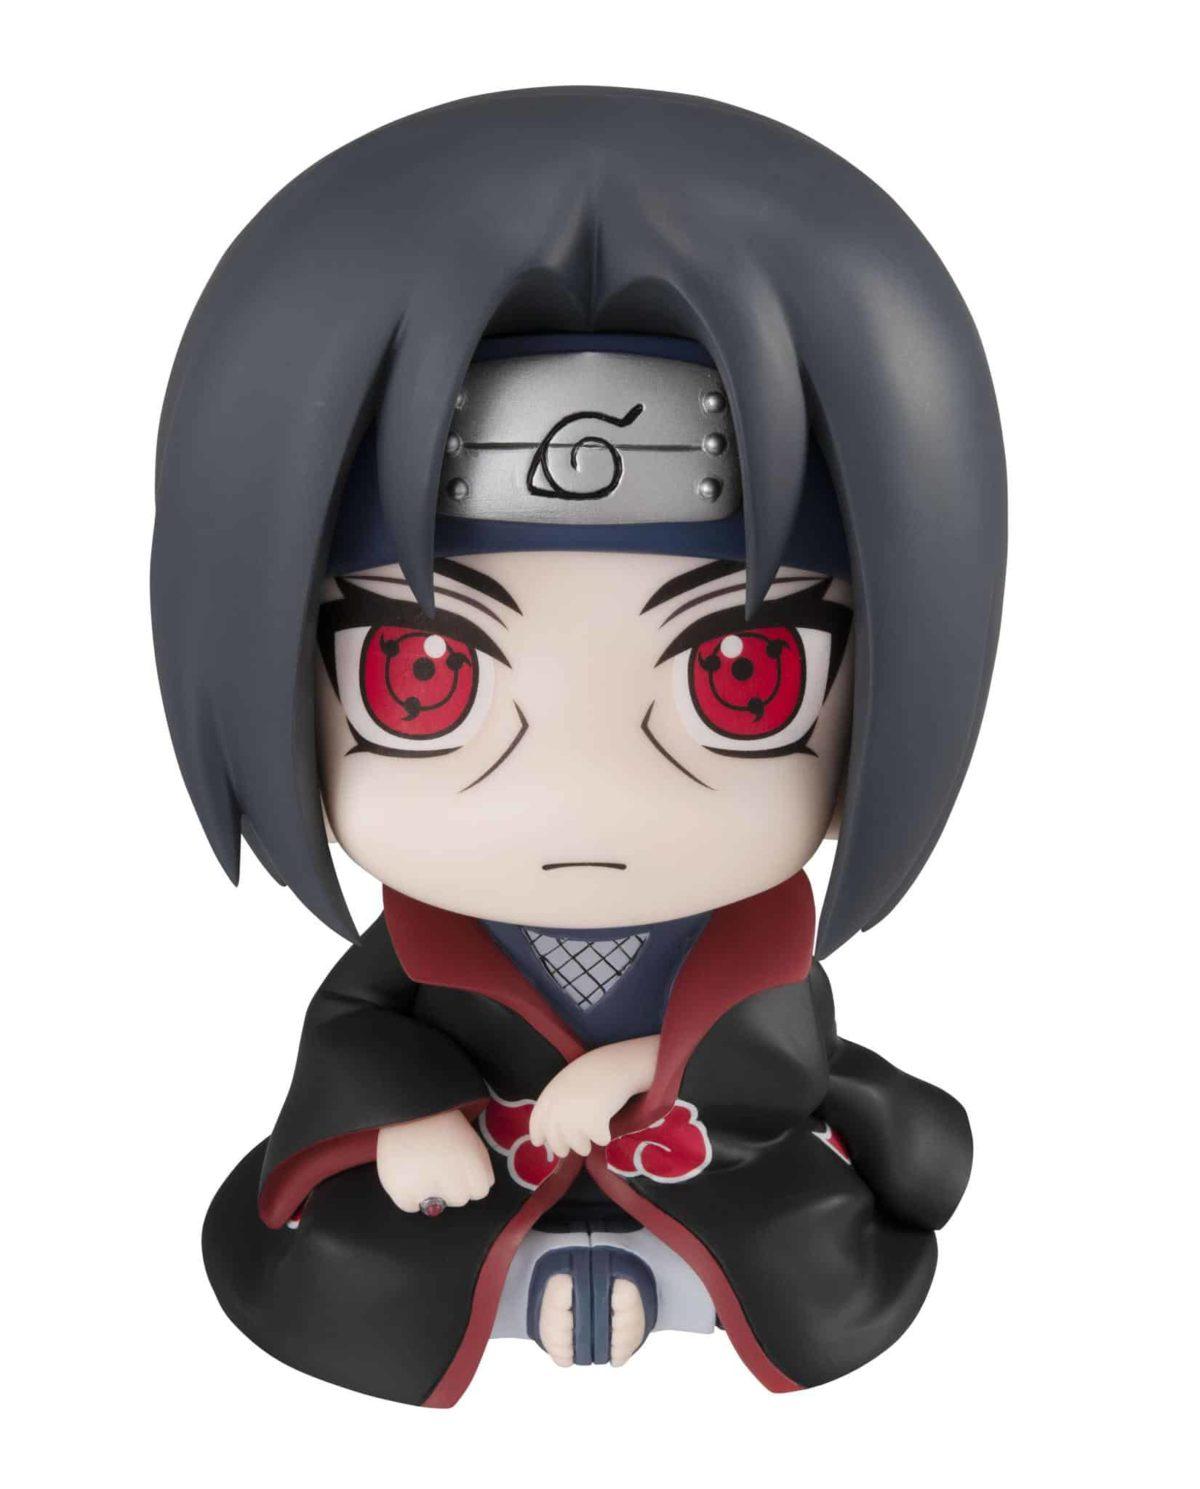 Naruto Shippuden Uchiha Itachi Lookup Series Figures